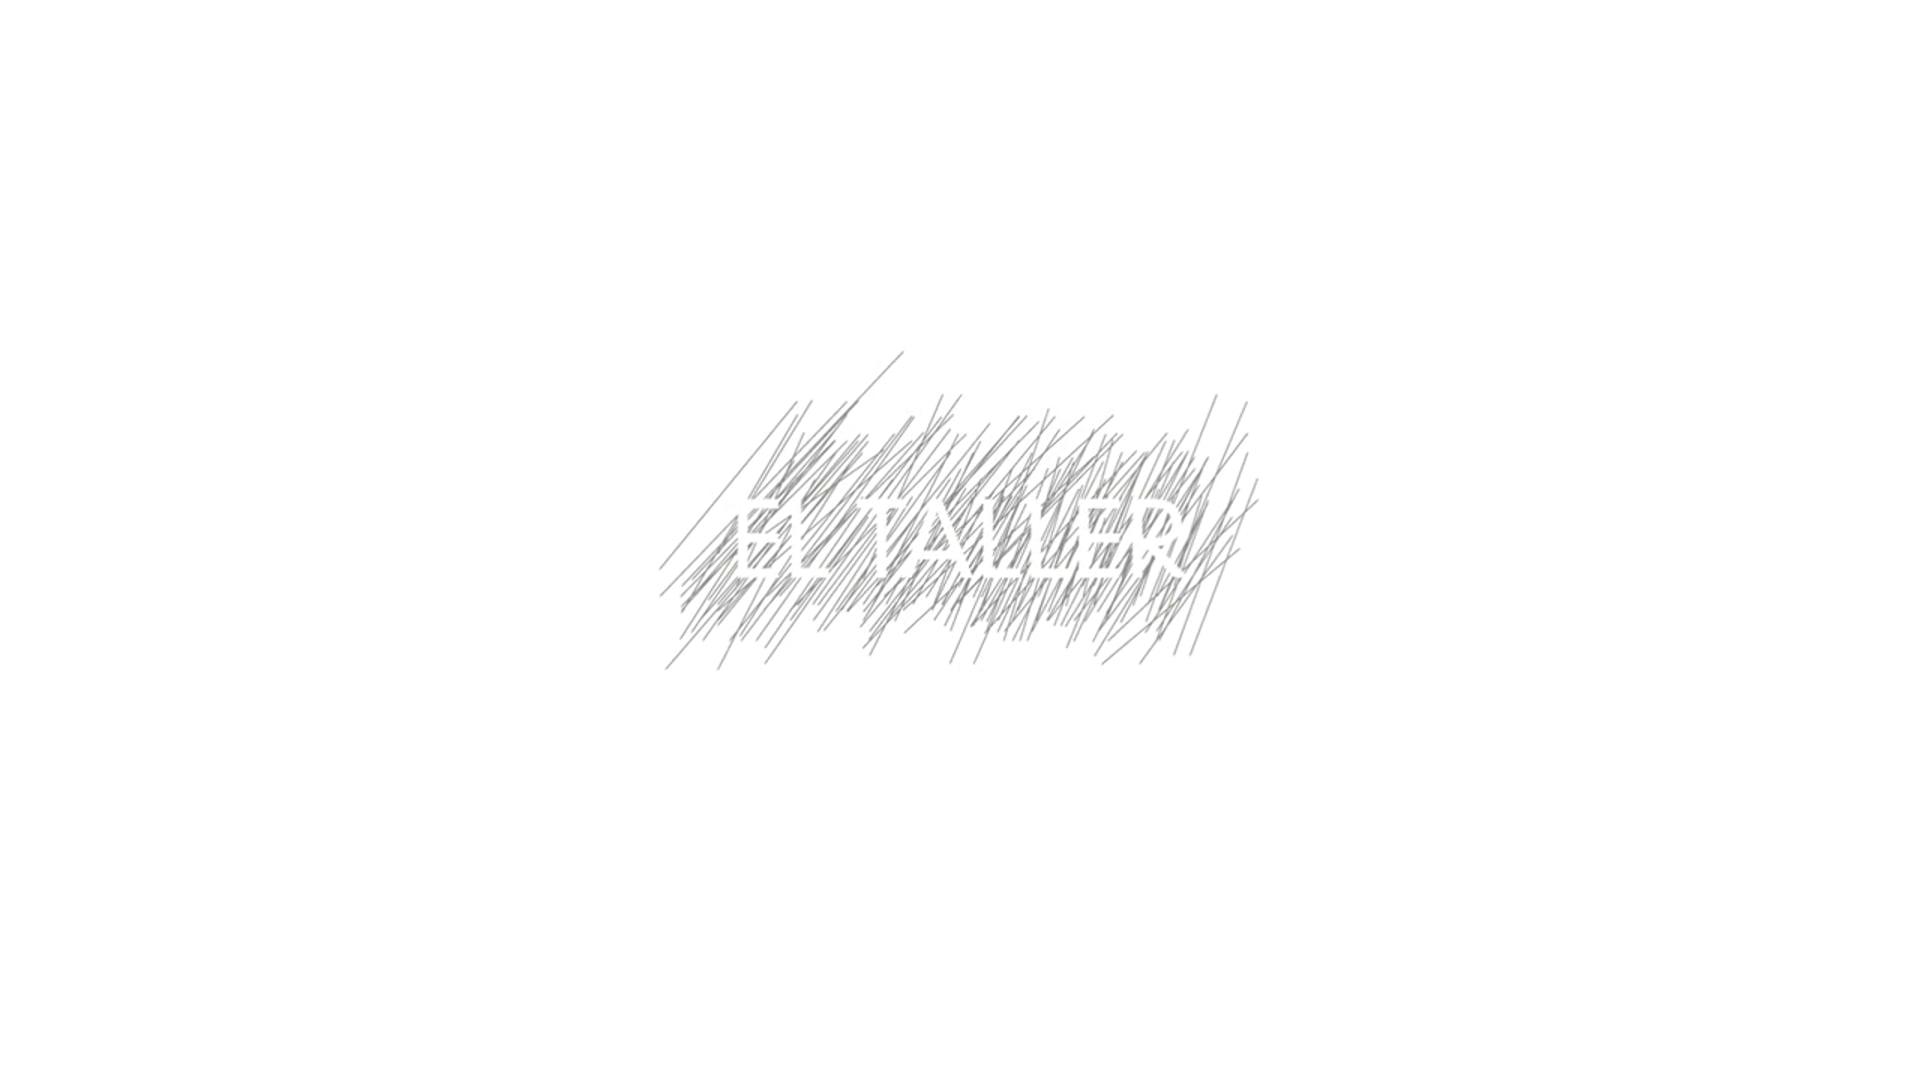 EL TALLER / Largometraje documental